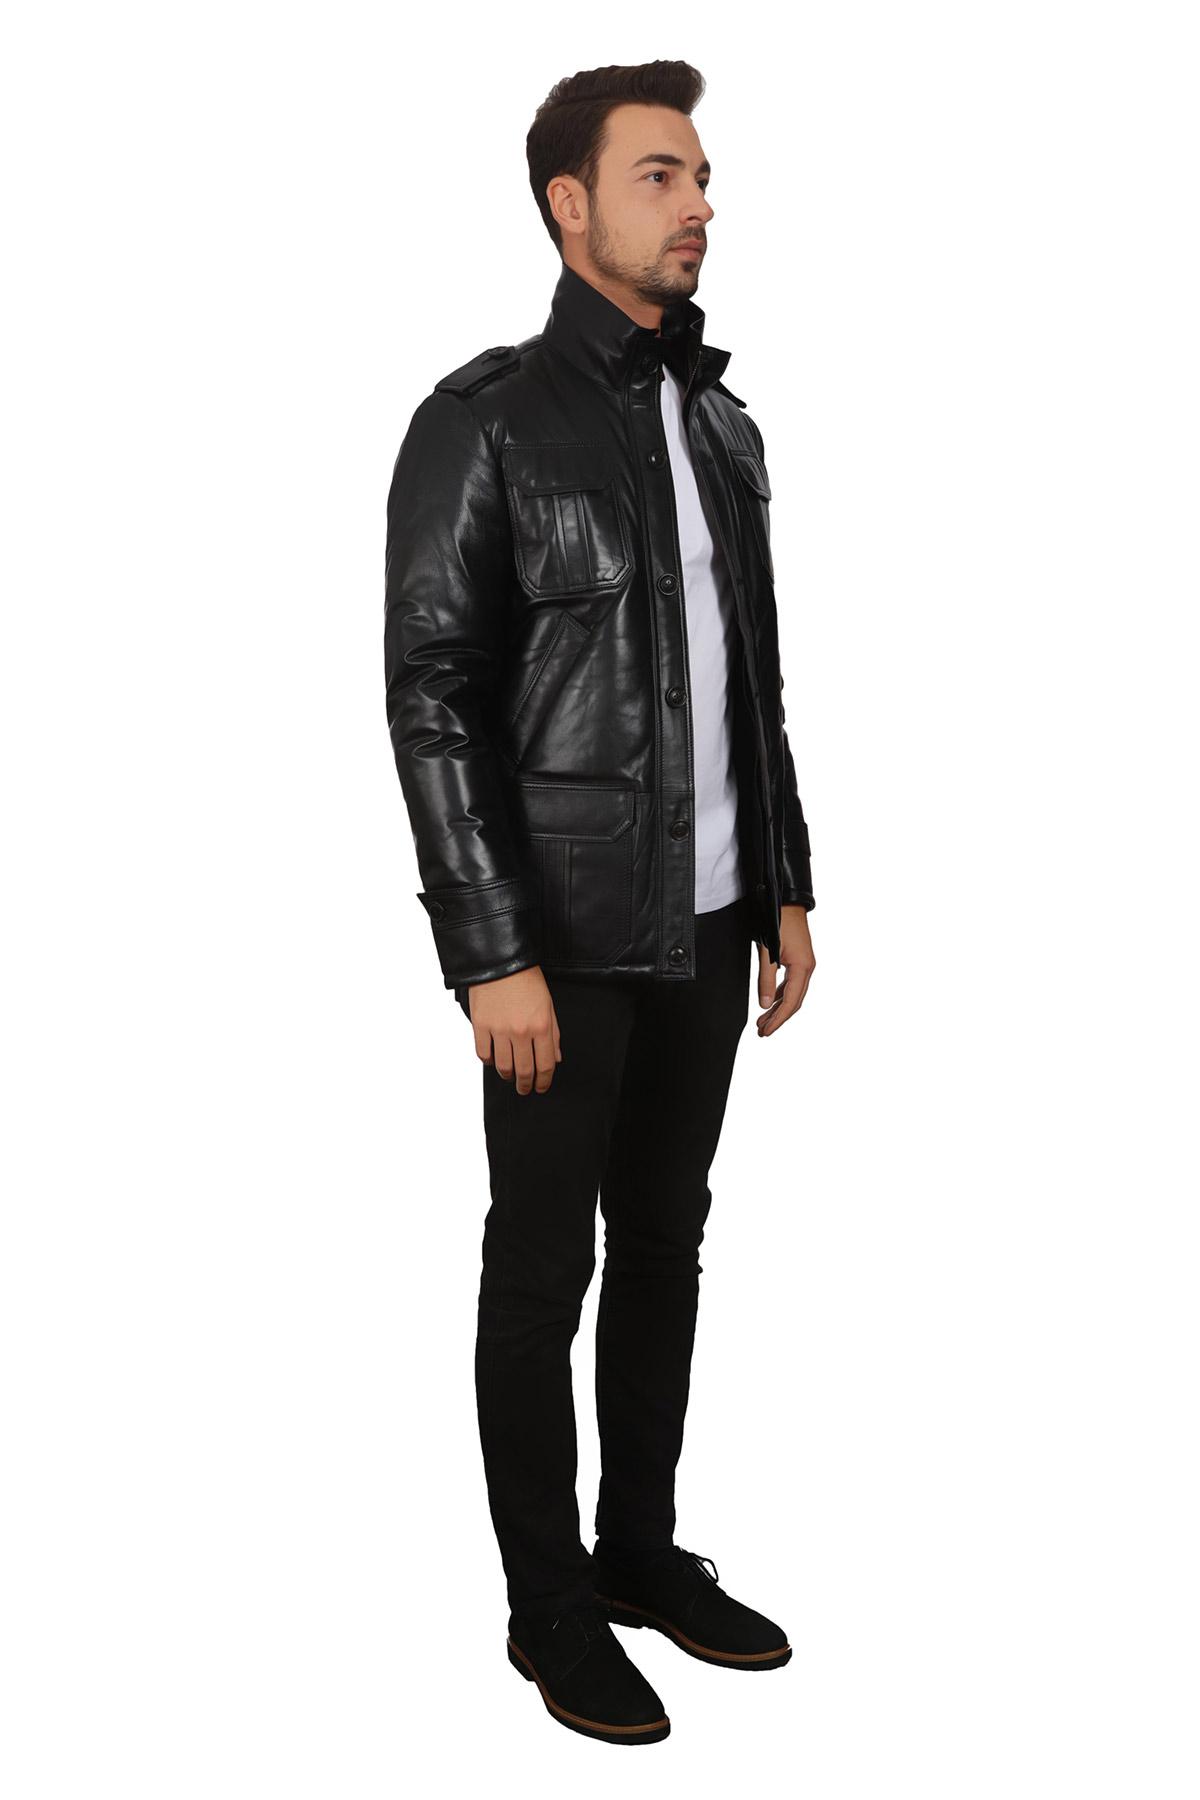 Clubmonaco Mens Leather Jacket